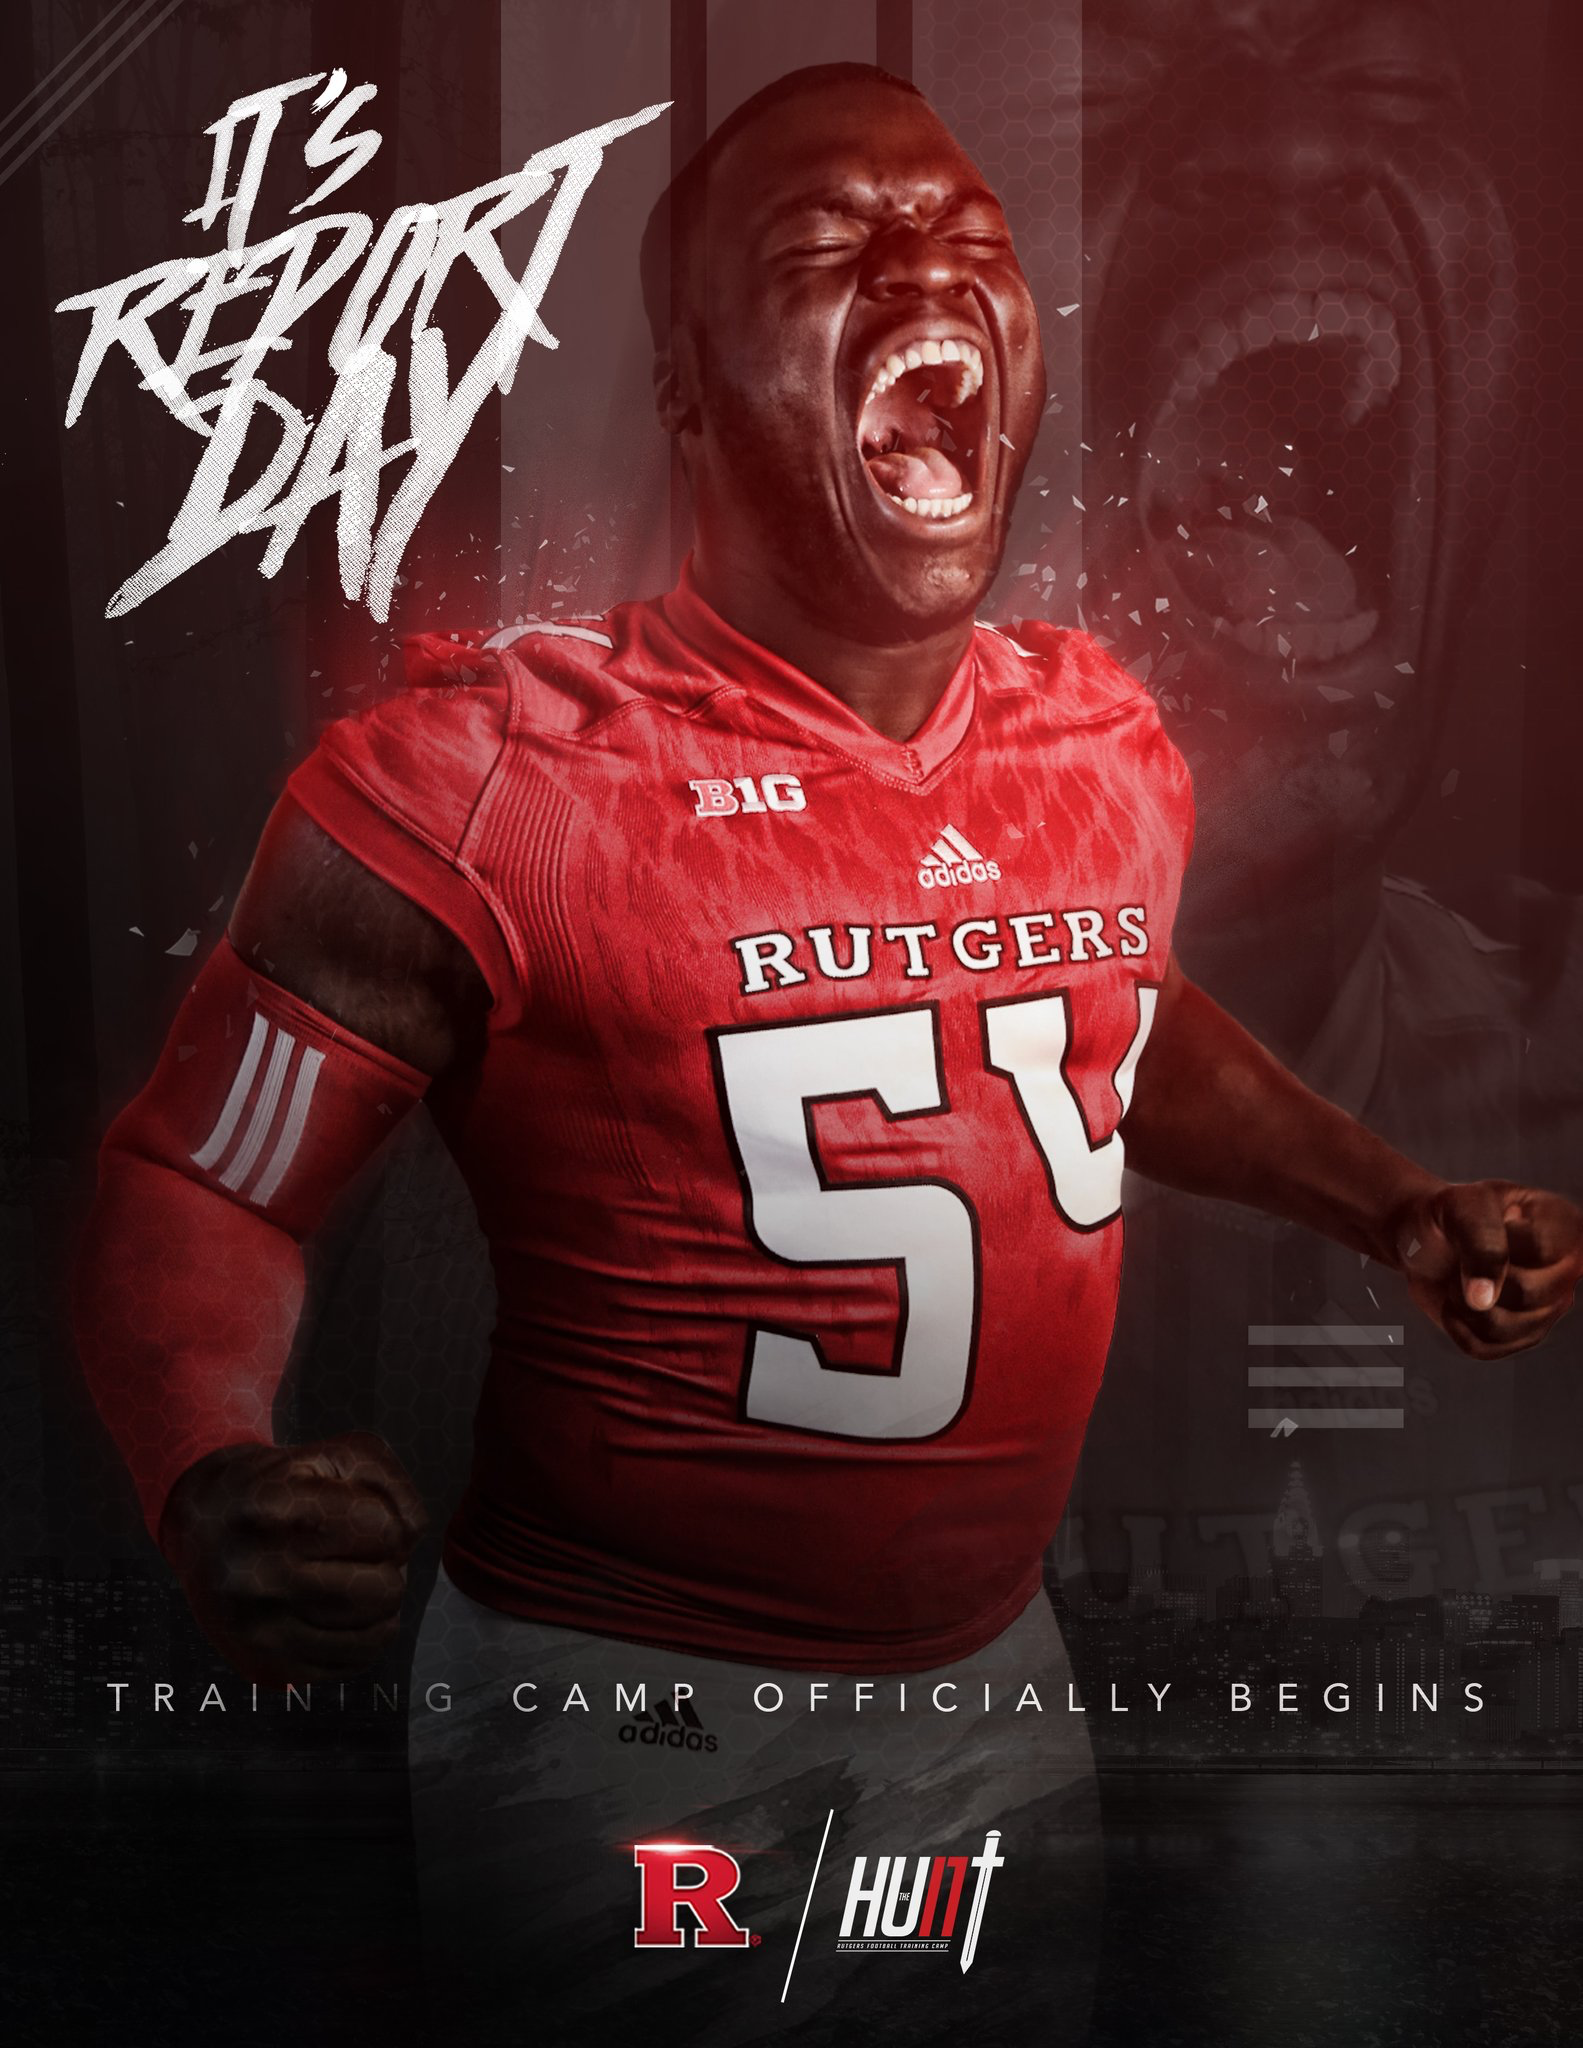 Rutgers Sports Design Sports Graphics Miami Football